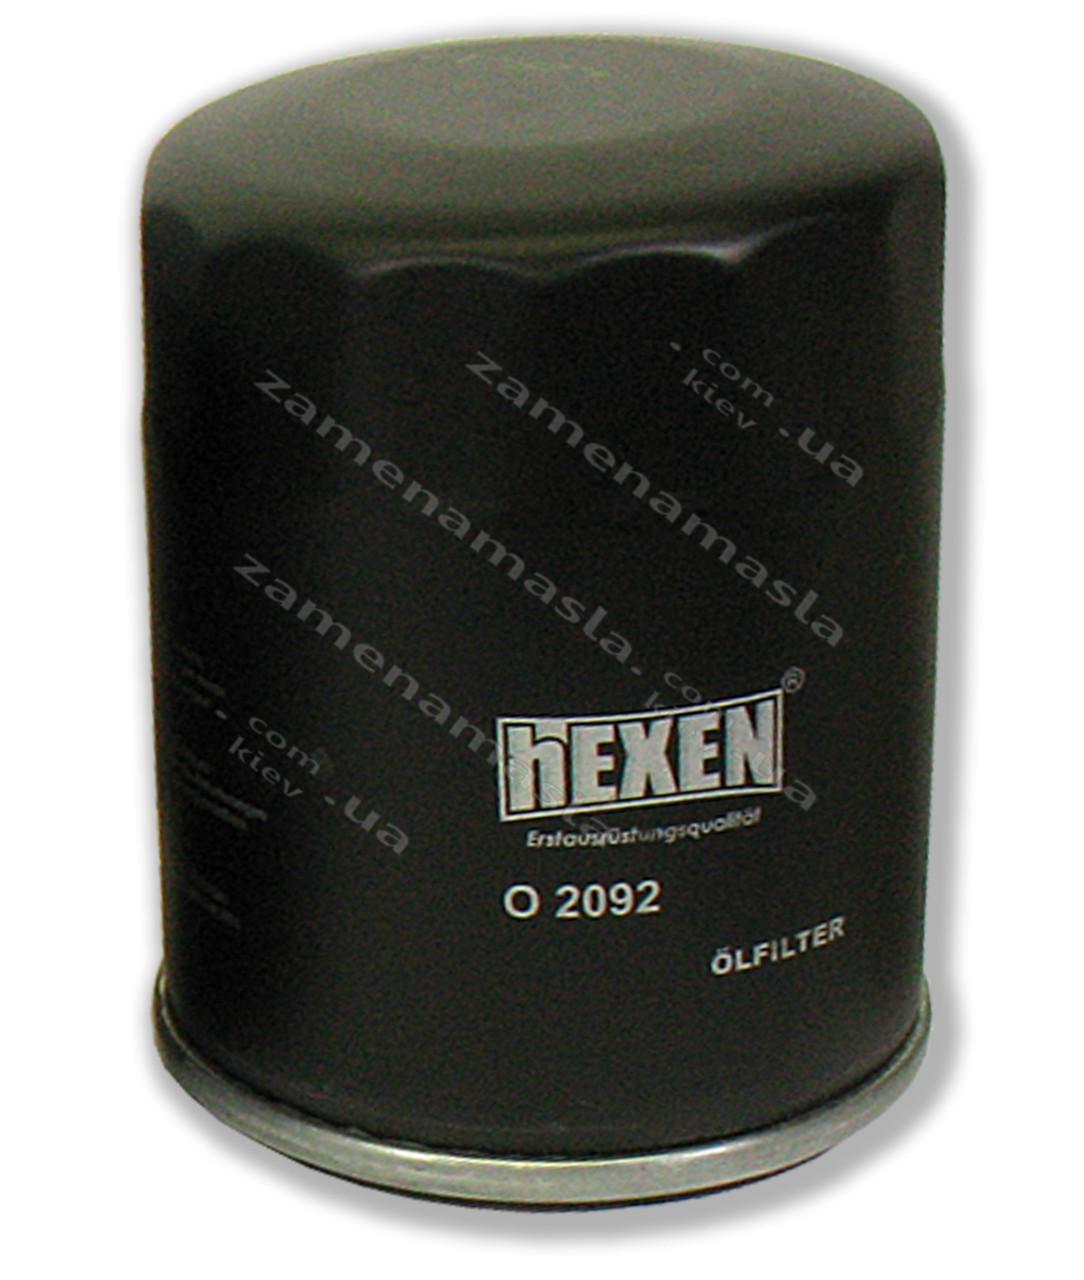 Hexen O2092 аналог SM-106 на John Deere; Citroën; Daihatsu; Toyota Auris, Avensis, Aygo, Camry FF, Carina